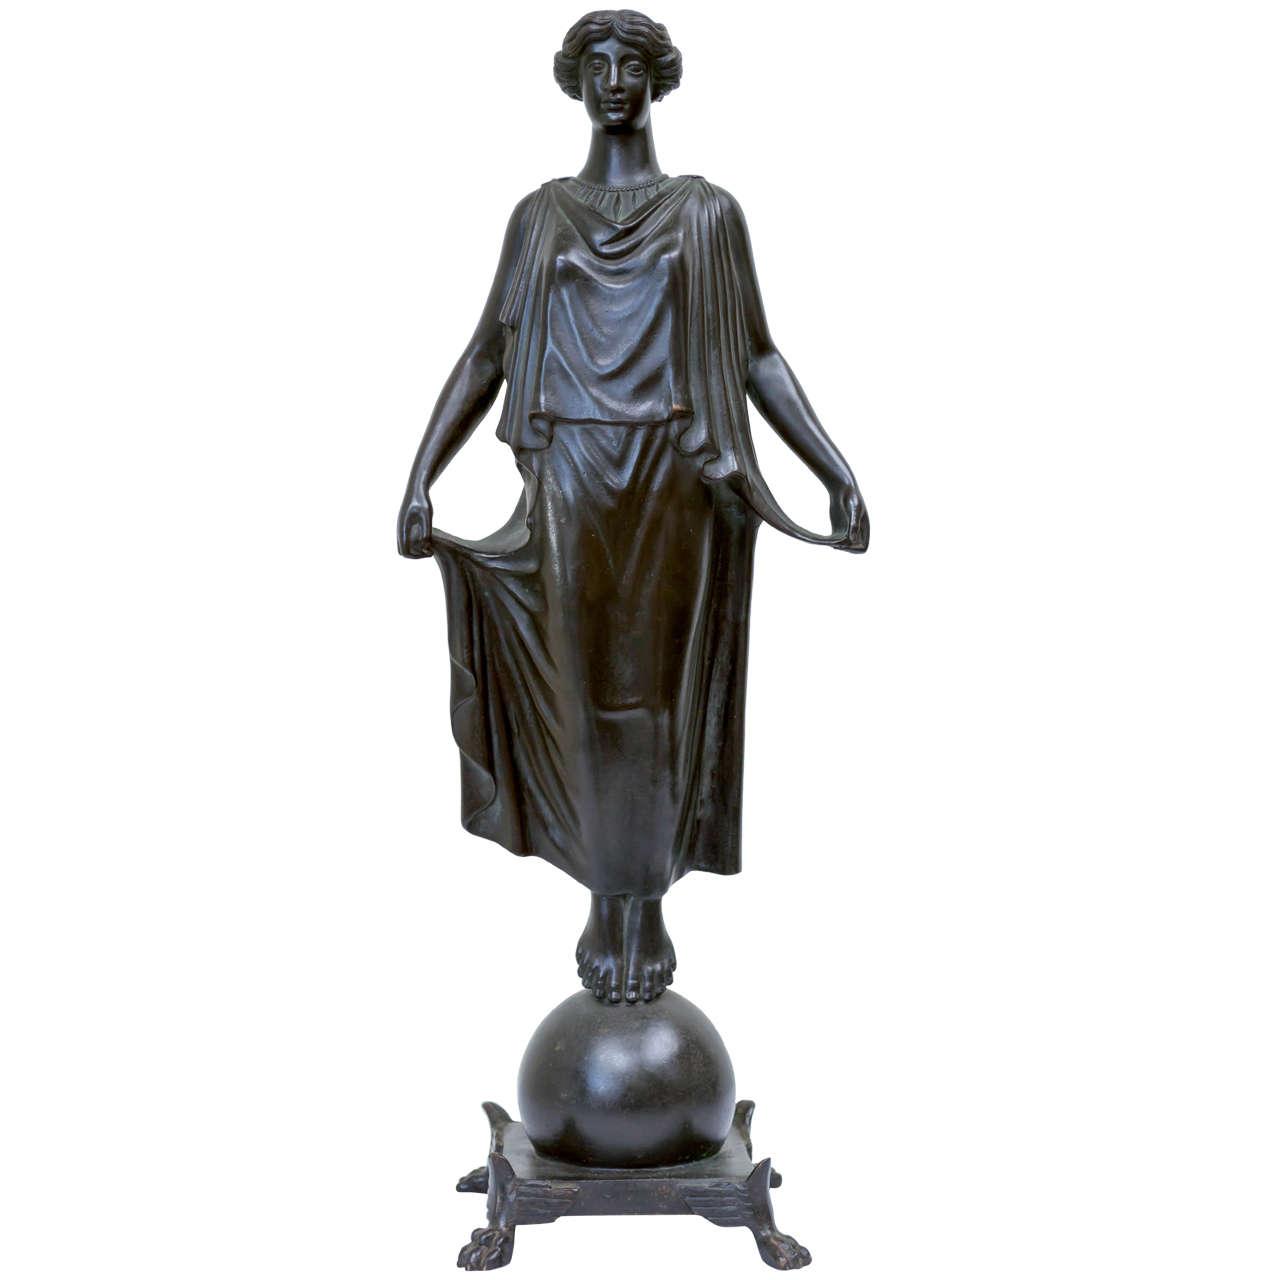 19th Century Roman Bronze Statue of a Woman